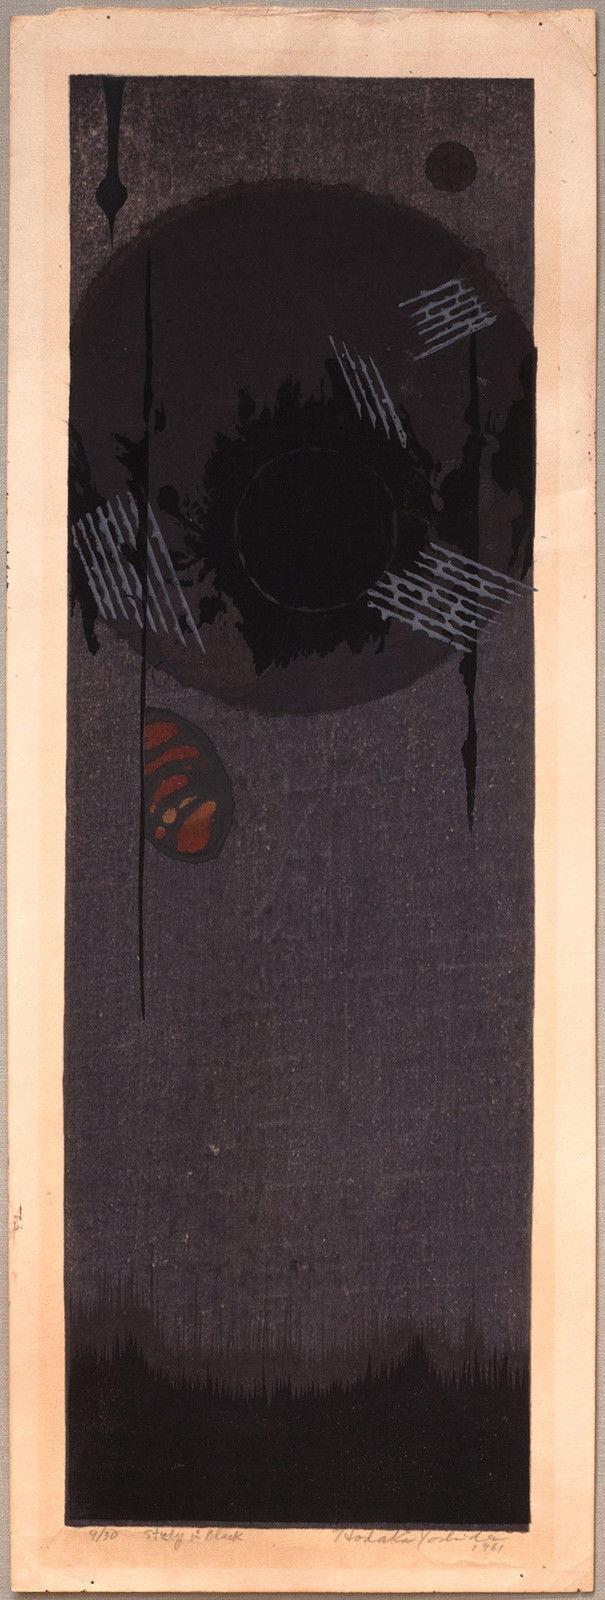 Study in Black by Hodaka Yoshida